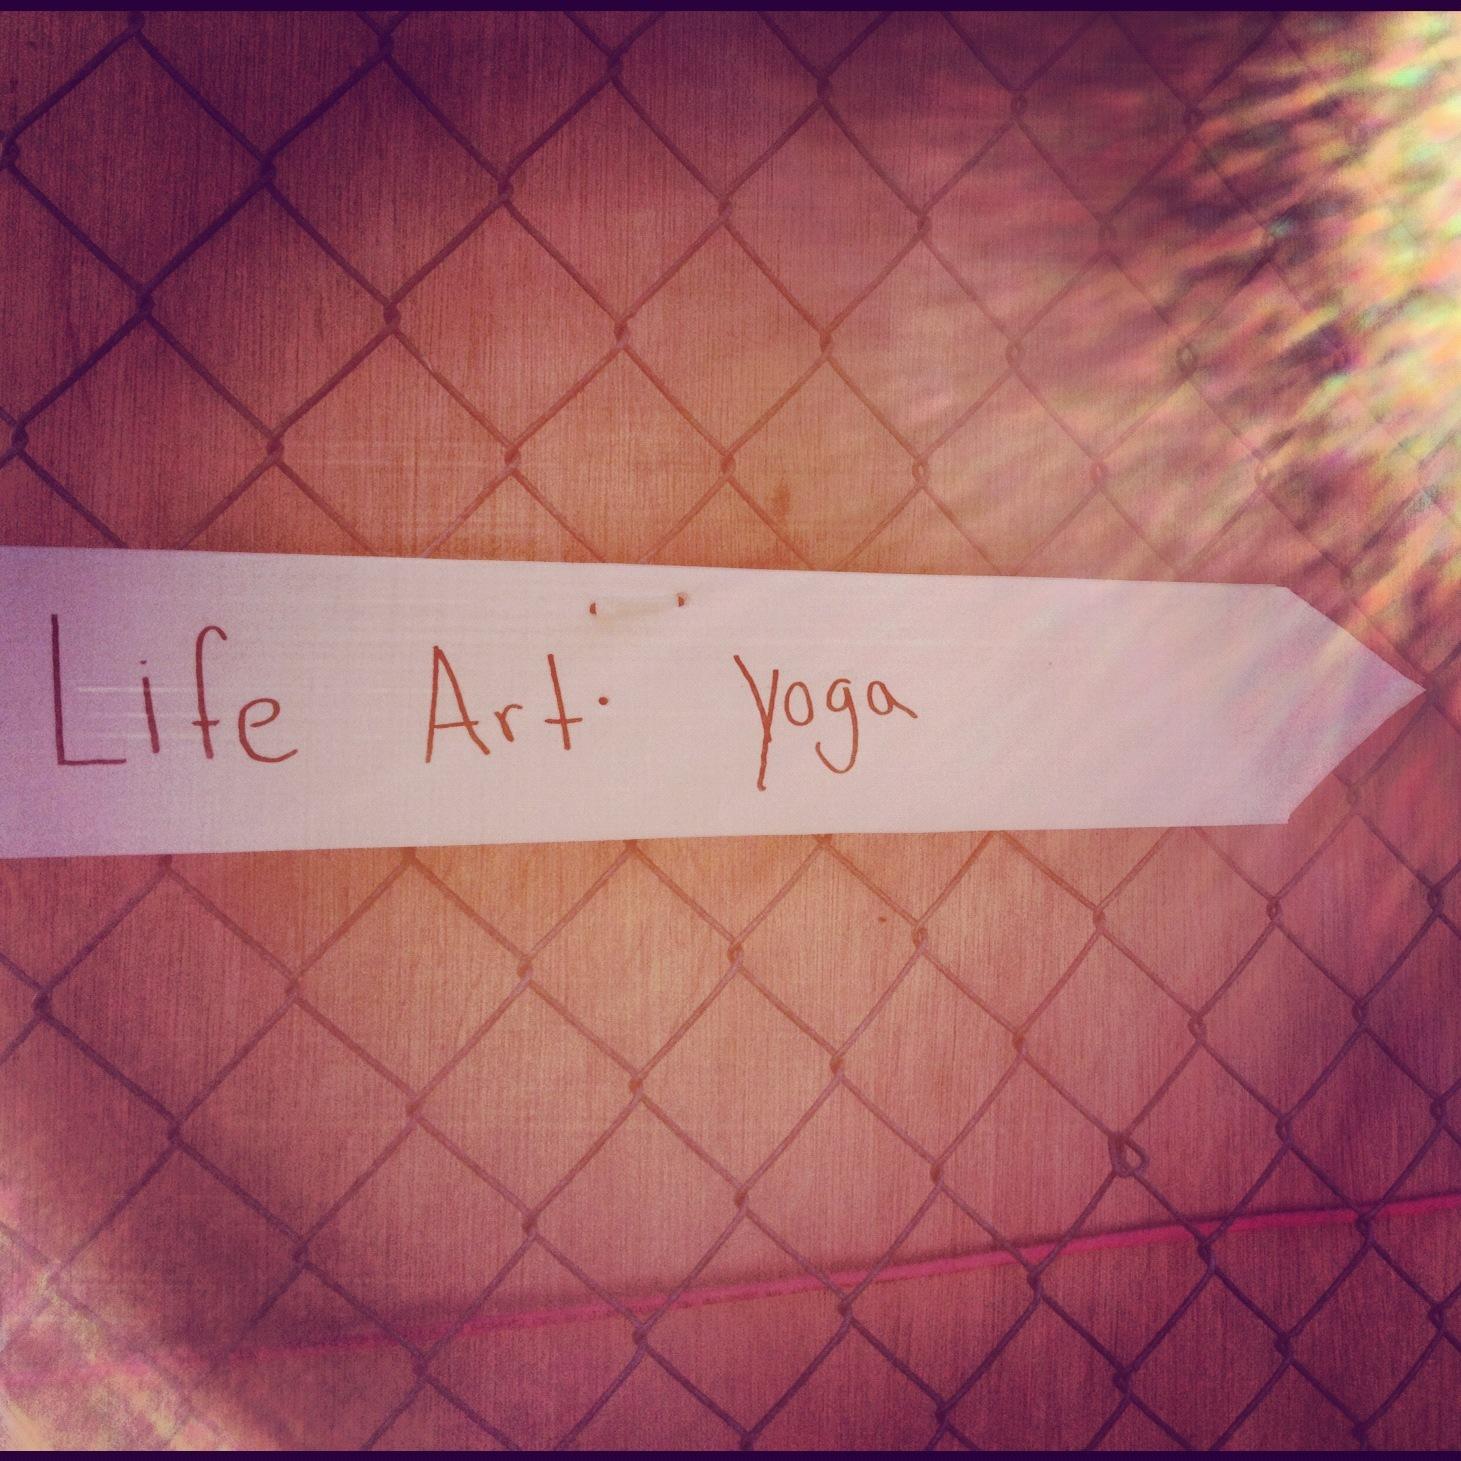 2012-08-21-Mantra.jpg